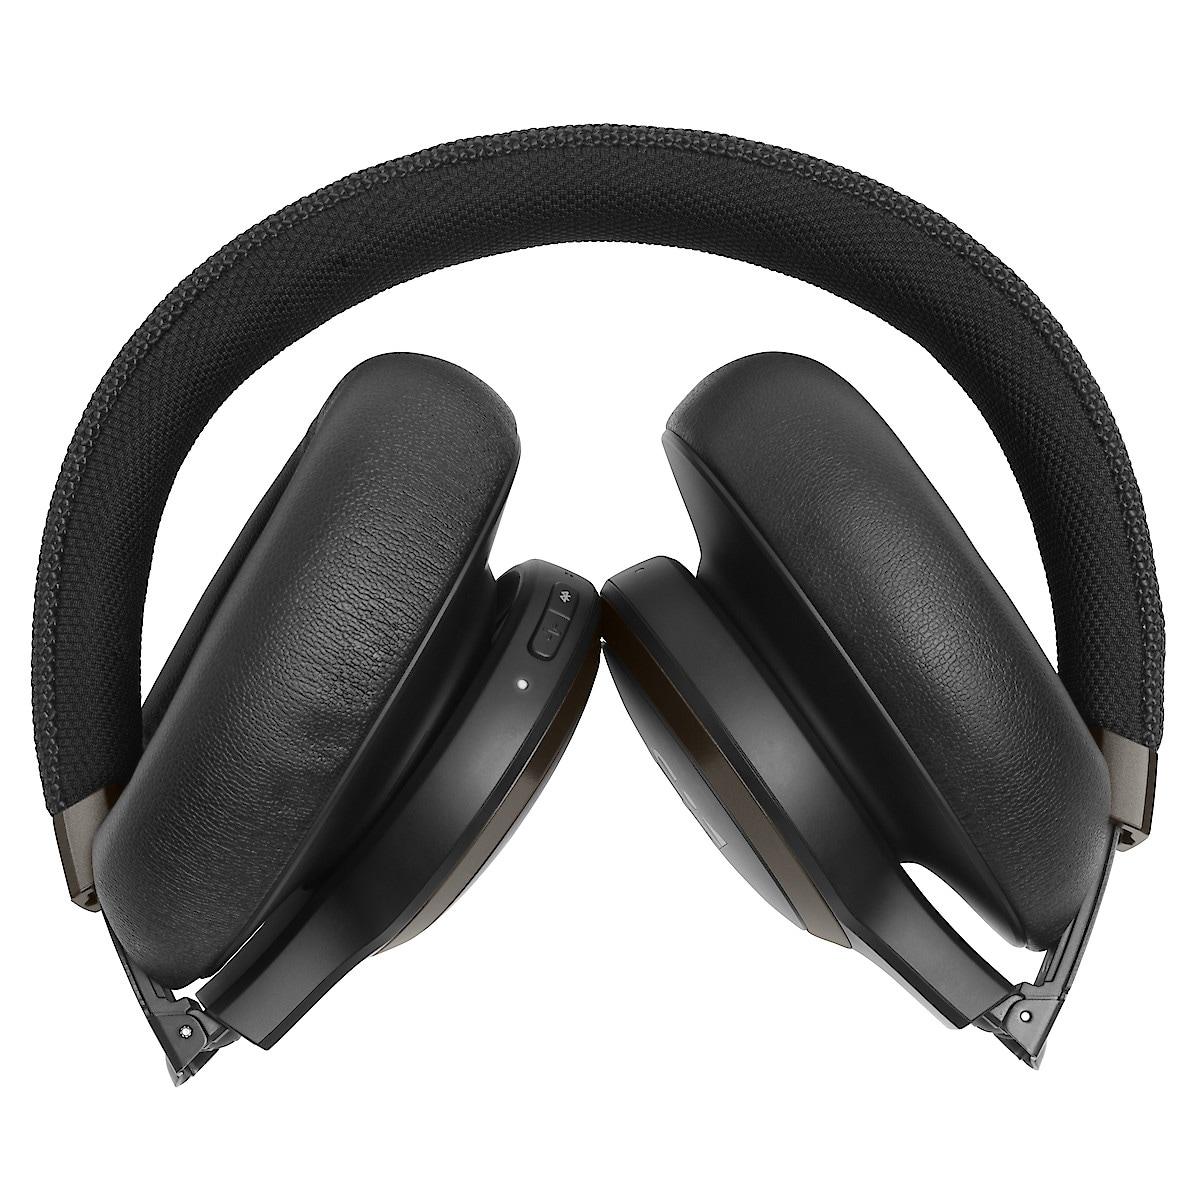 Brusreducerande hörlurar, JBL Live650BTNC